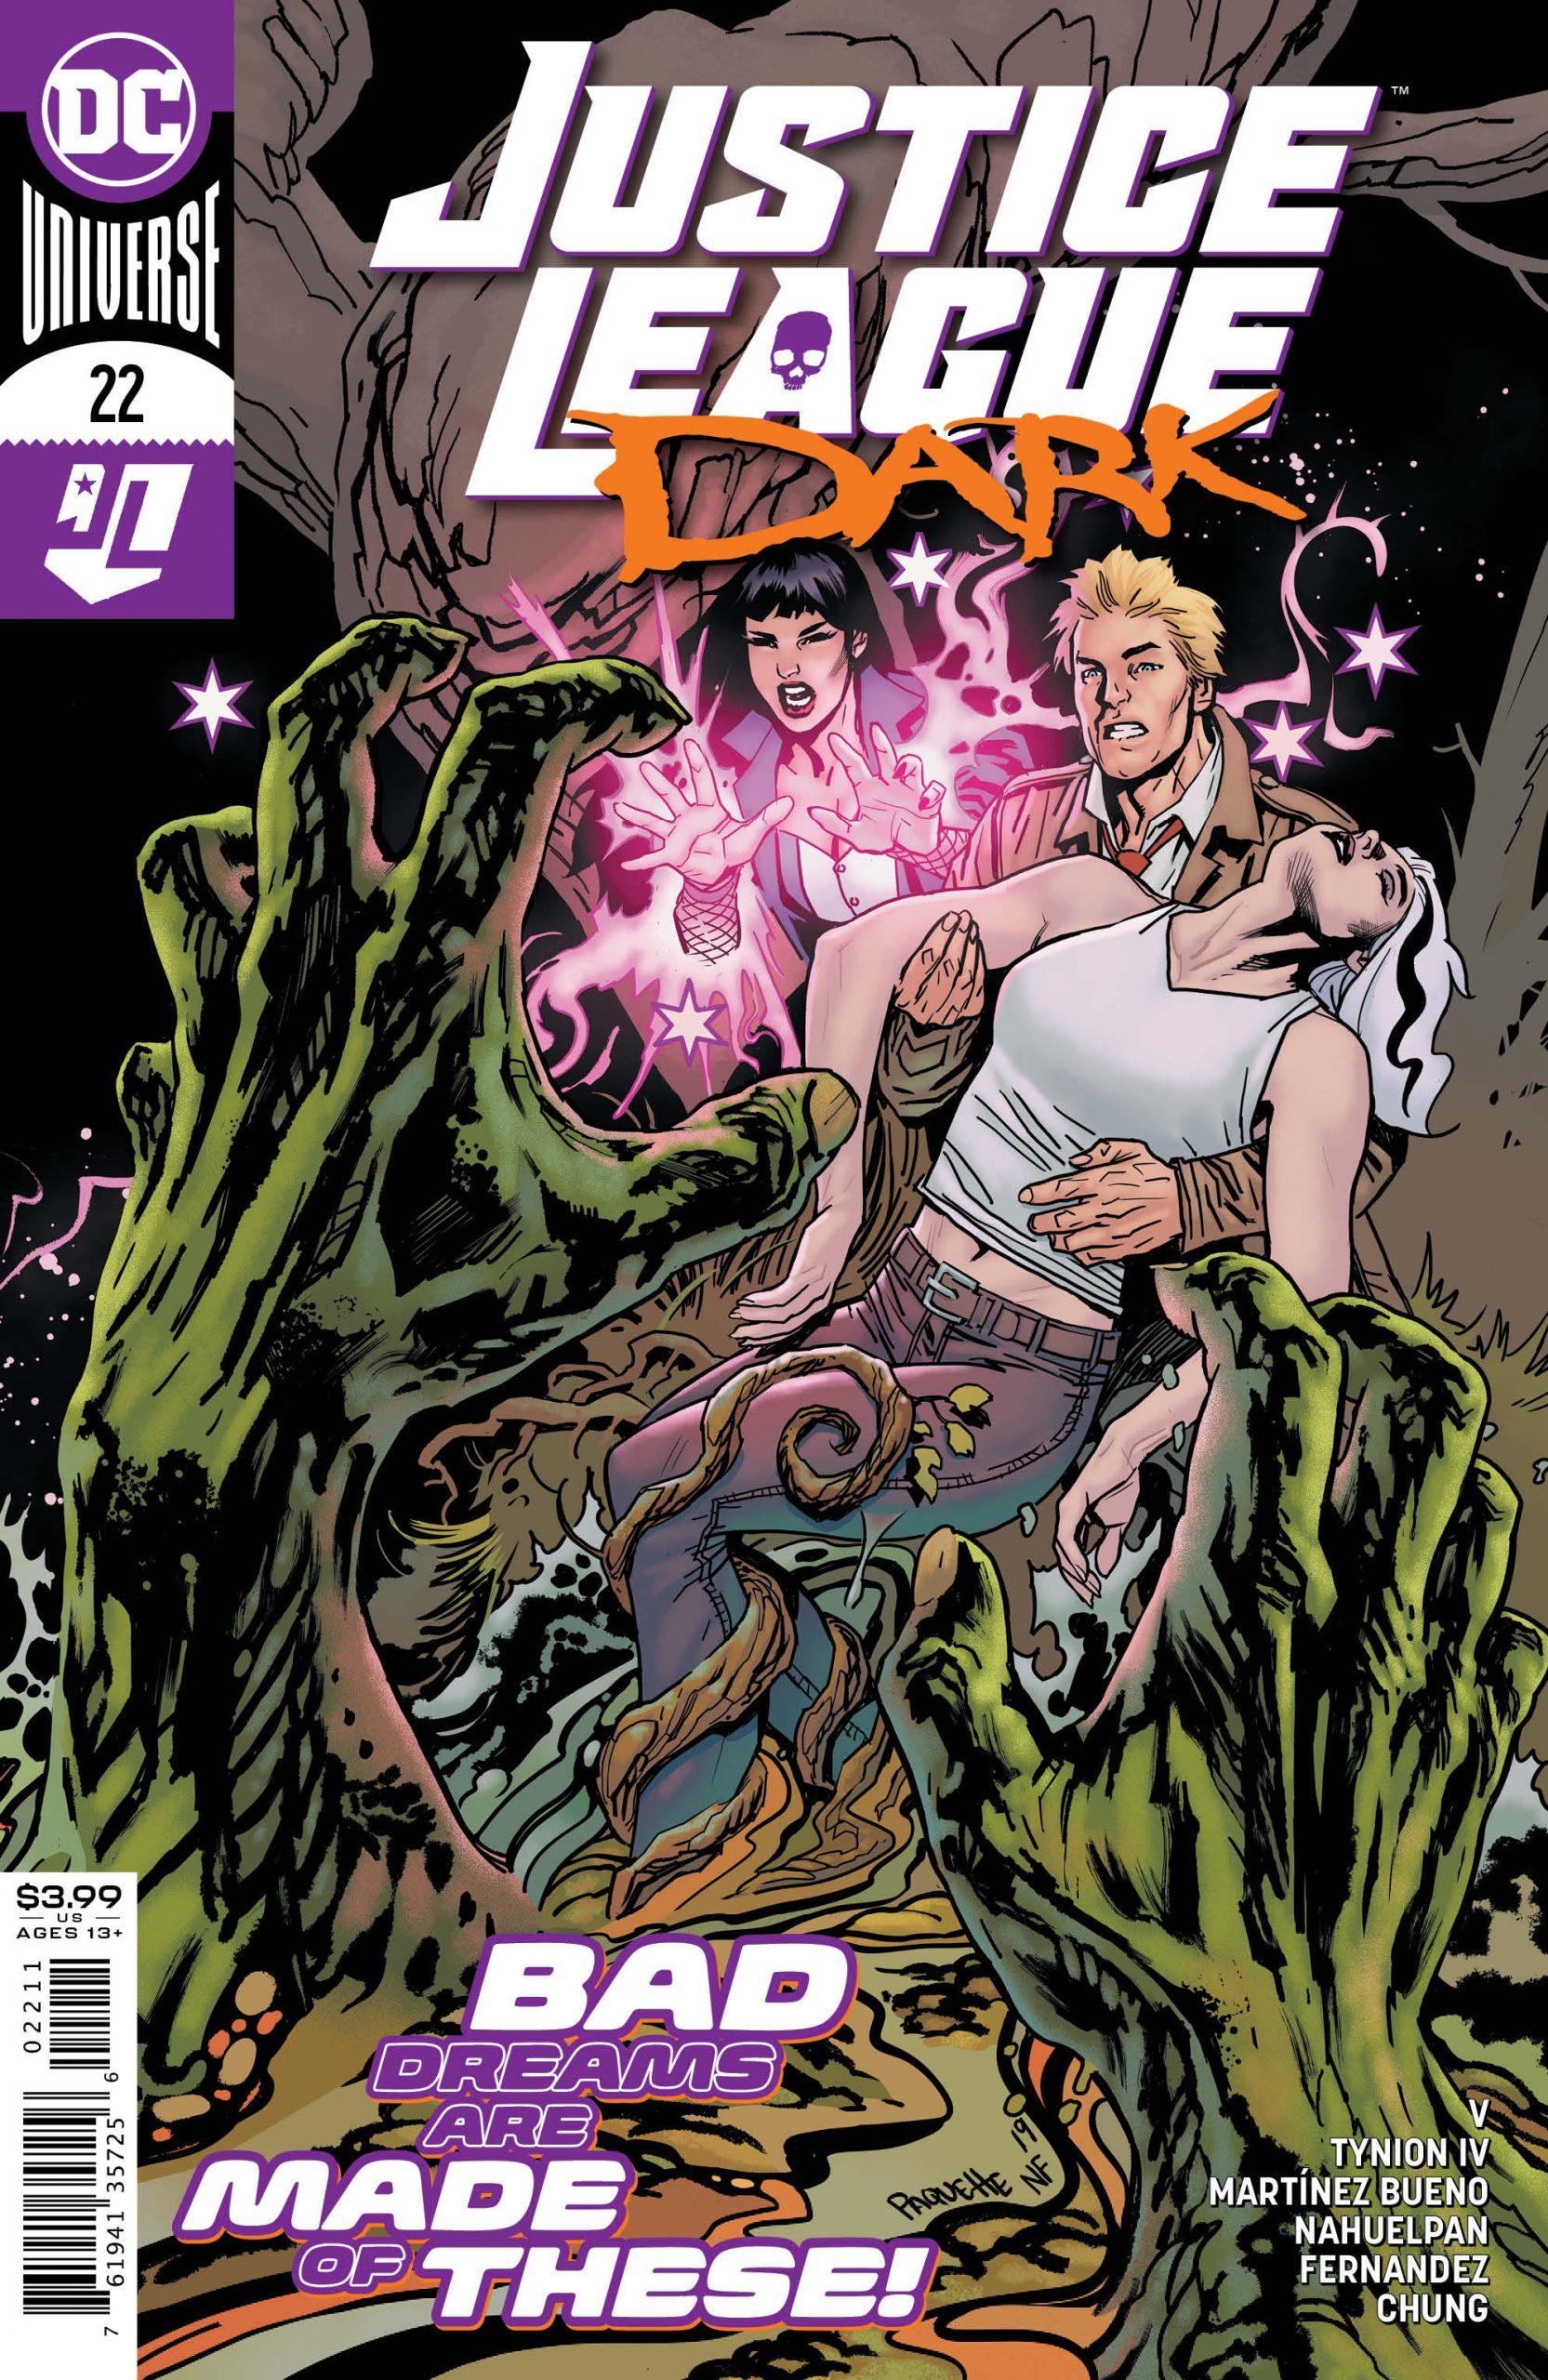 Justice League Dark #22 Cover